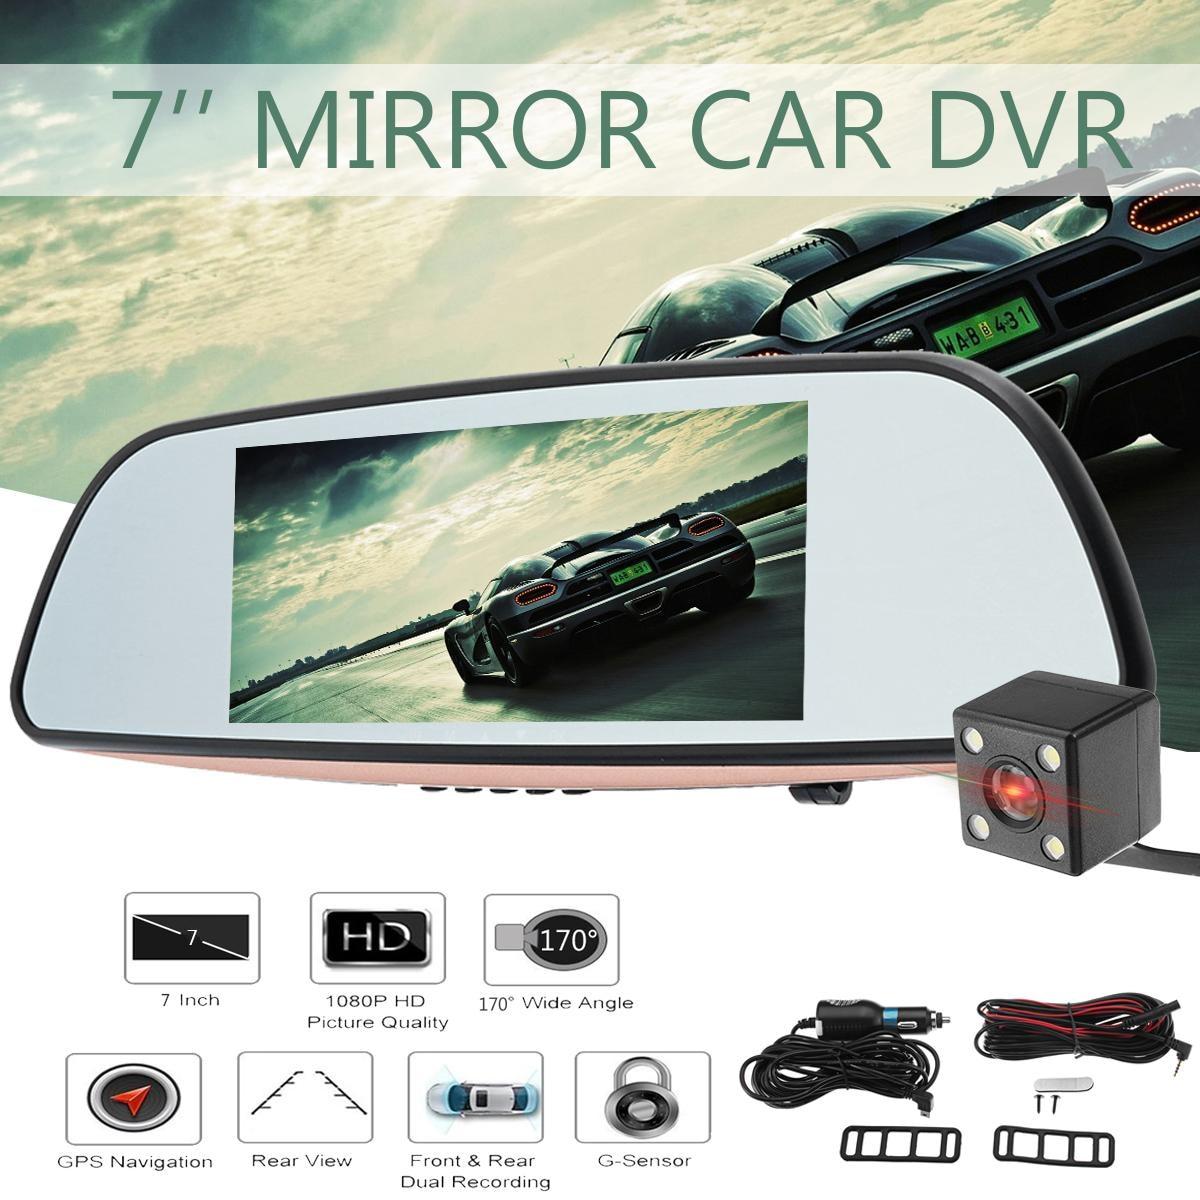 купить 7 Inch Touch Screen Car DVR Dual Lens Camera Rearview Mirror Video Recorder Dash Cam Auto Camera Portable Recorder по цене 3294.48 рублей